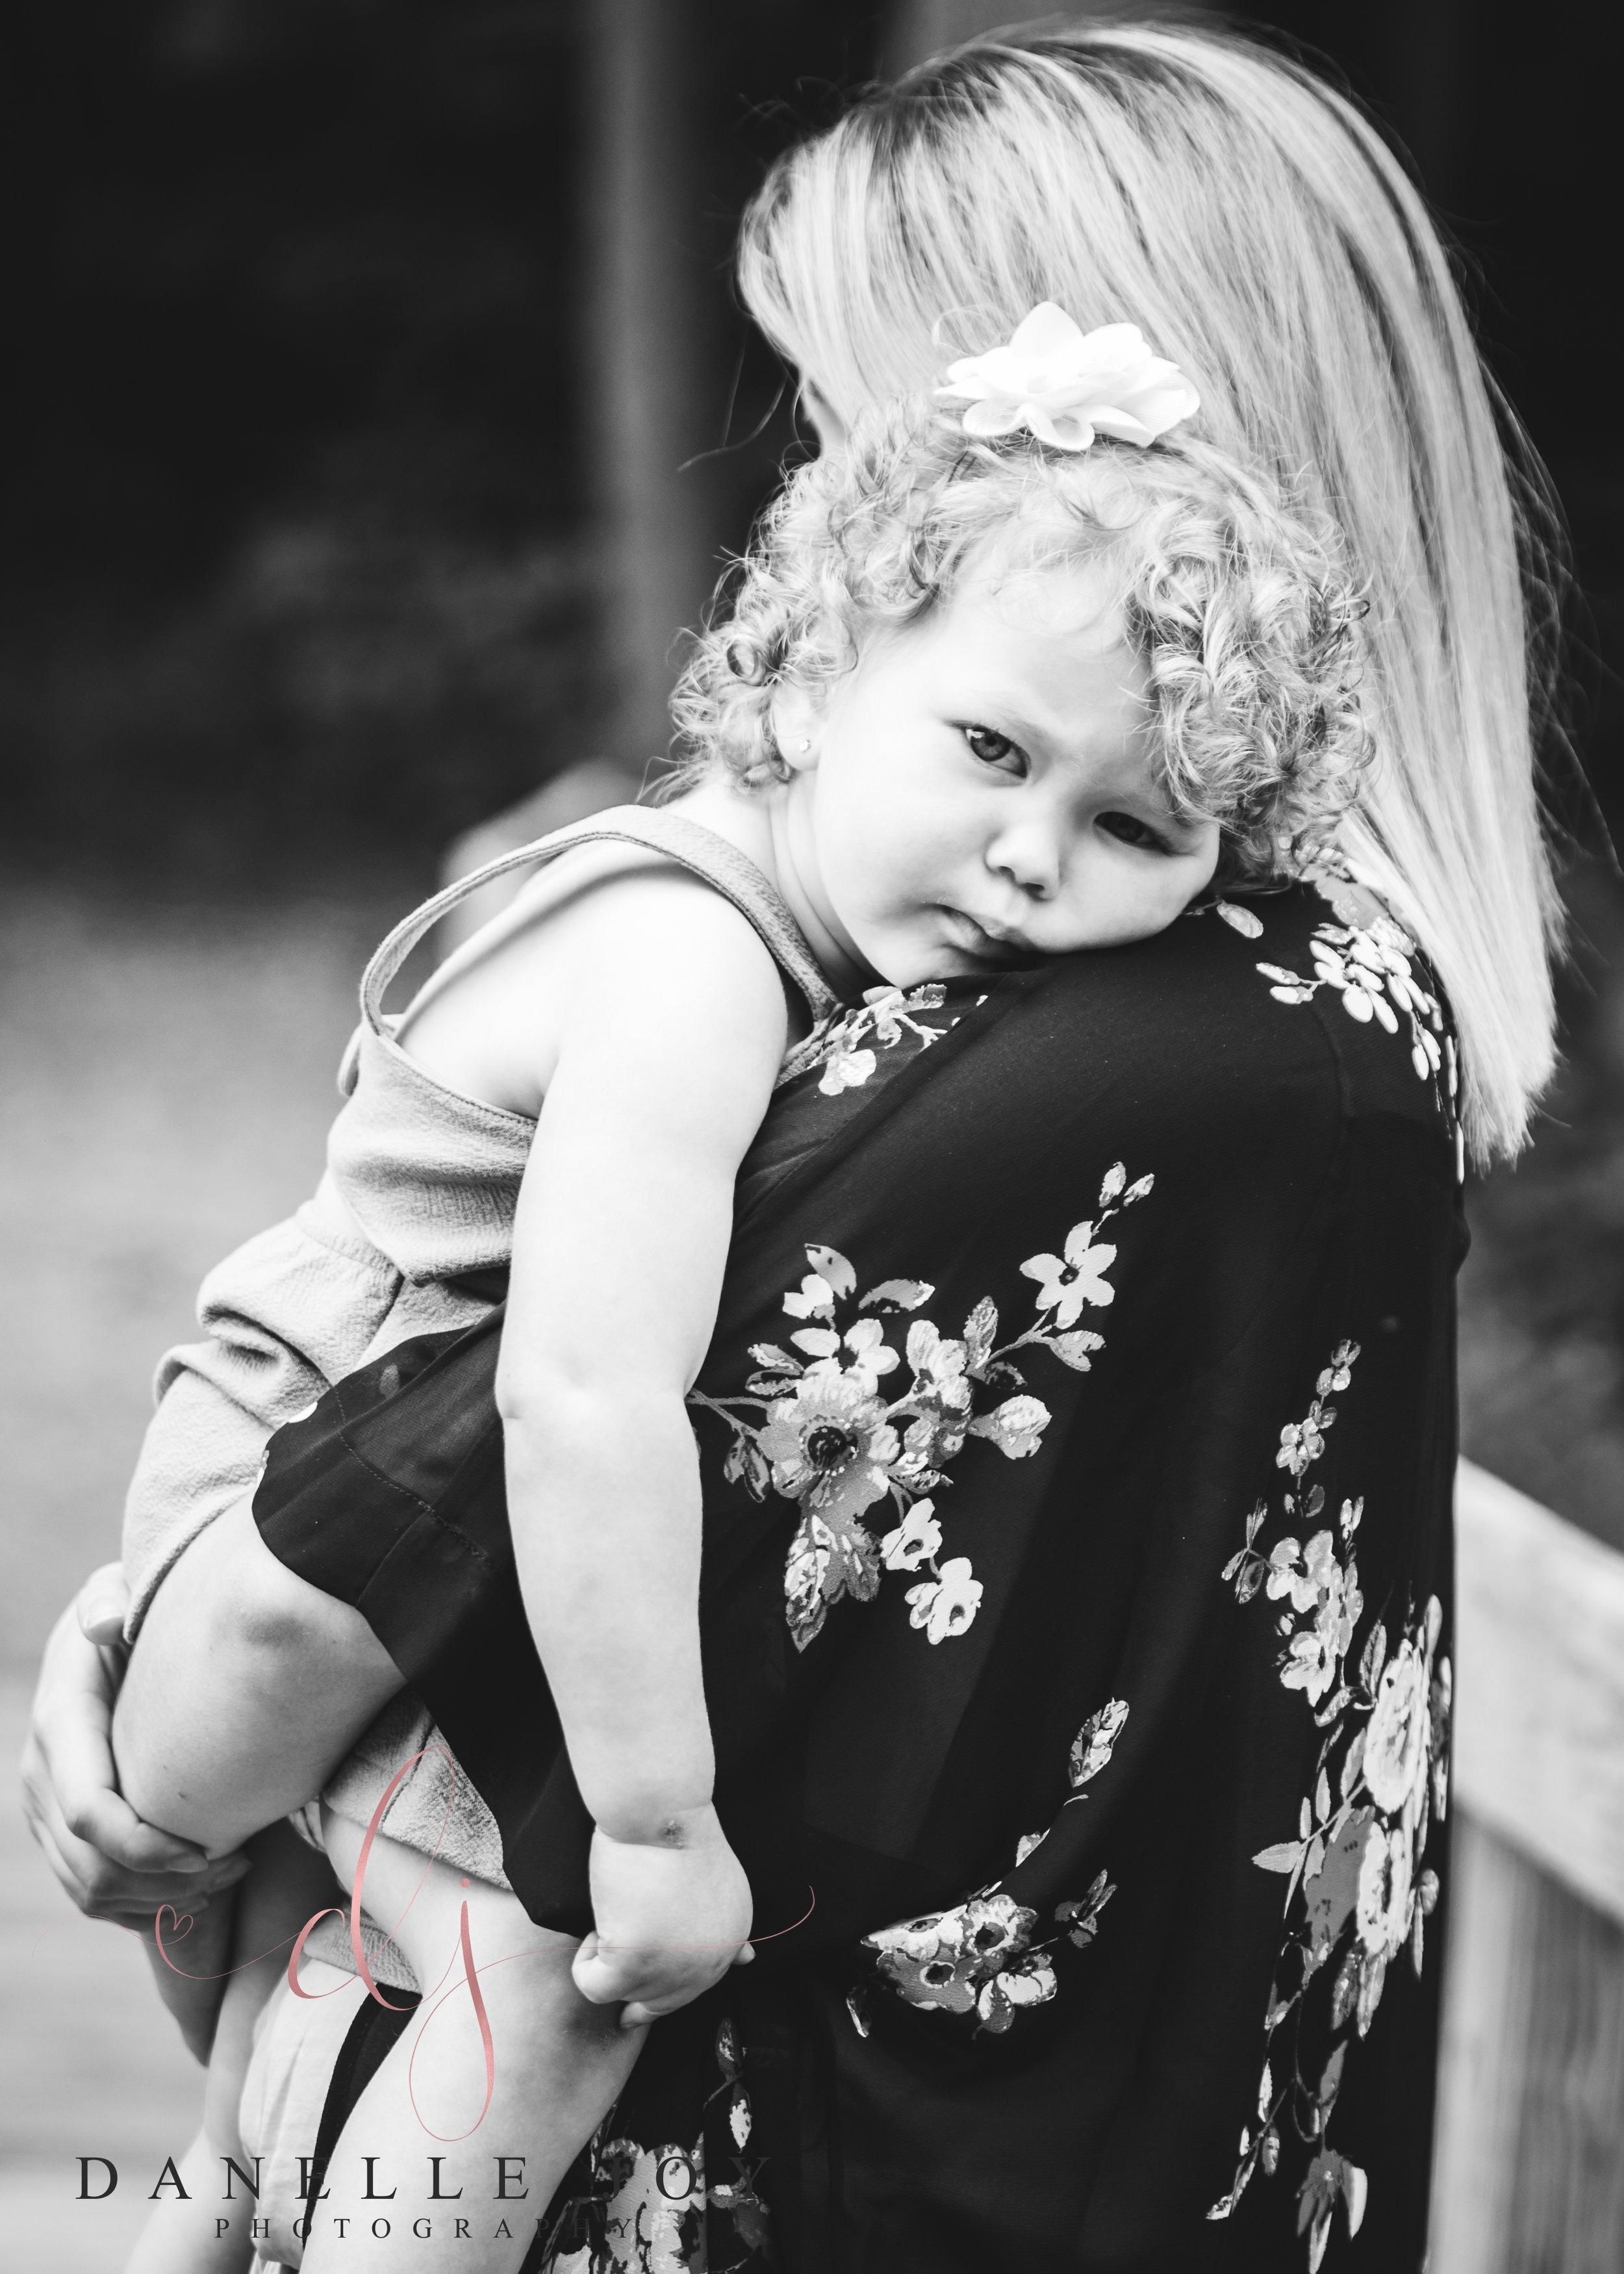 child photographer, child photography, milestone photography, family photography, family photographer